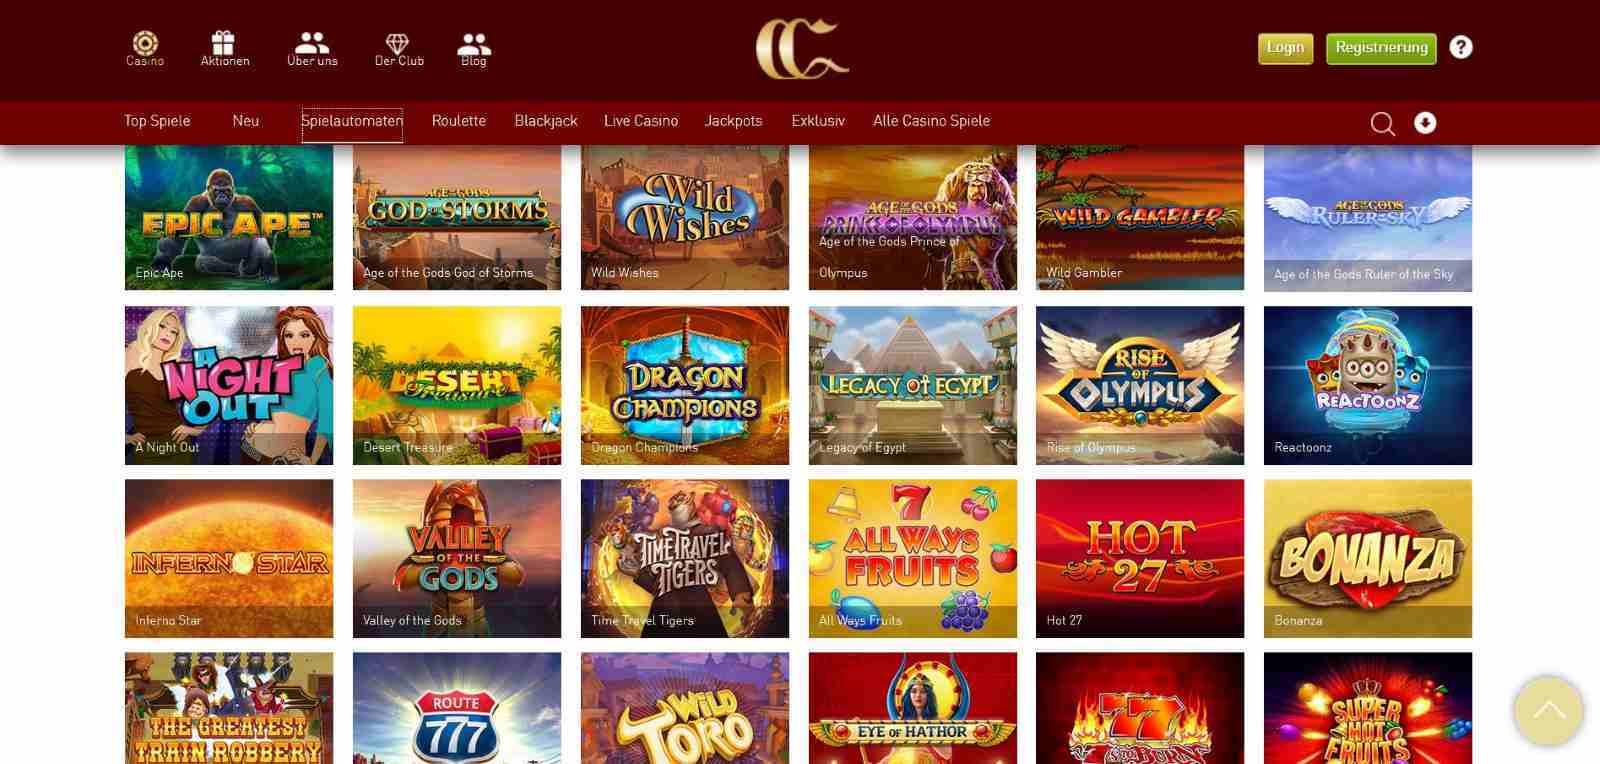 casinoclub spielautomaten